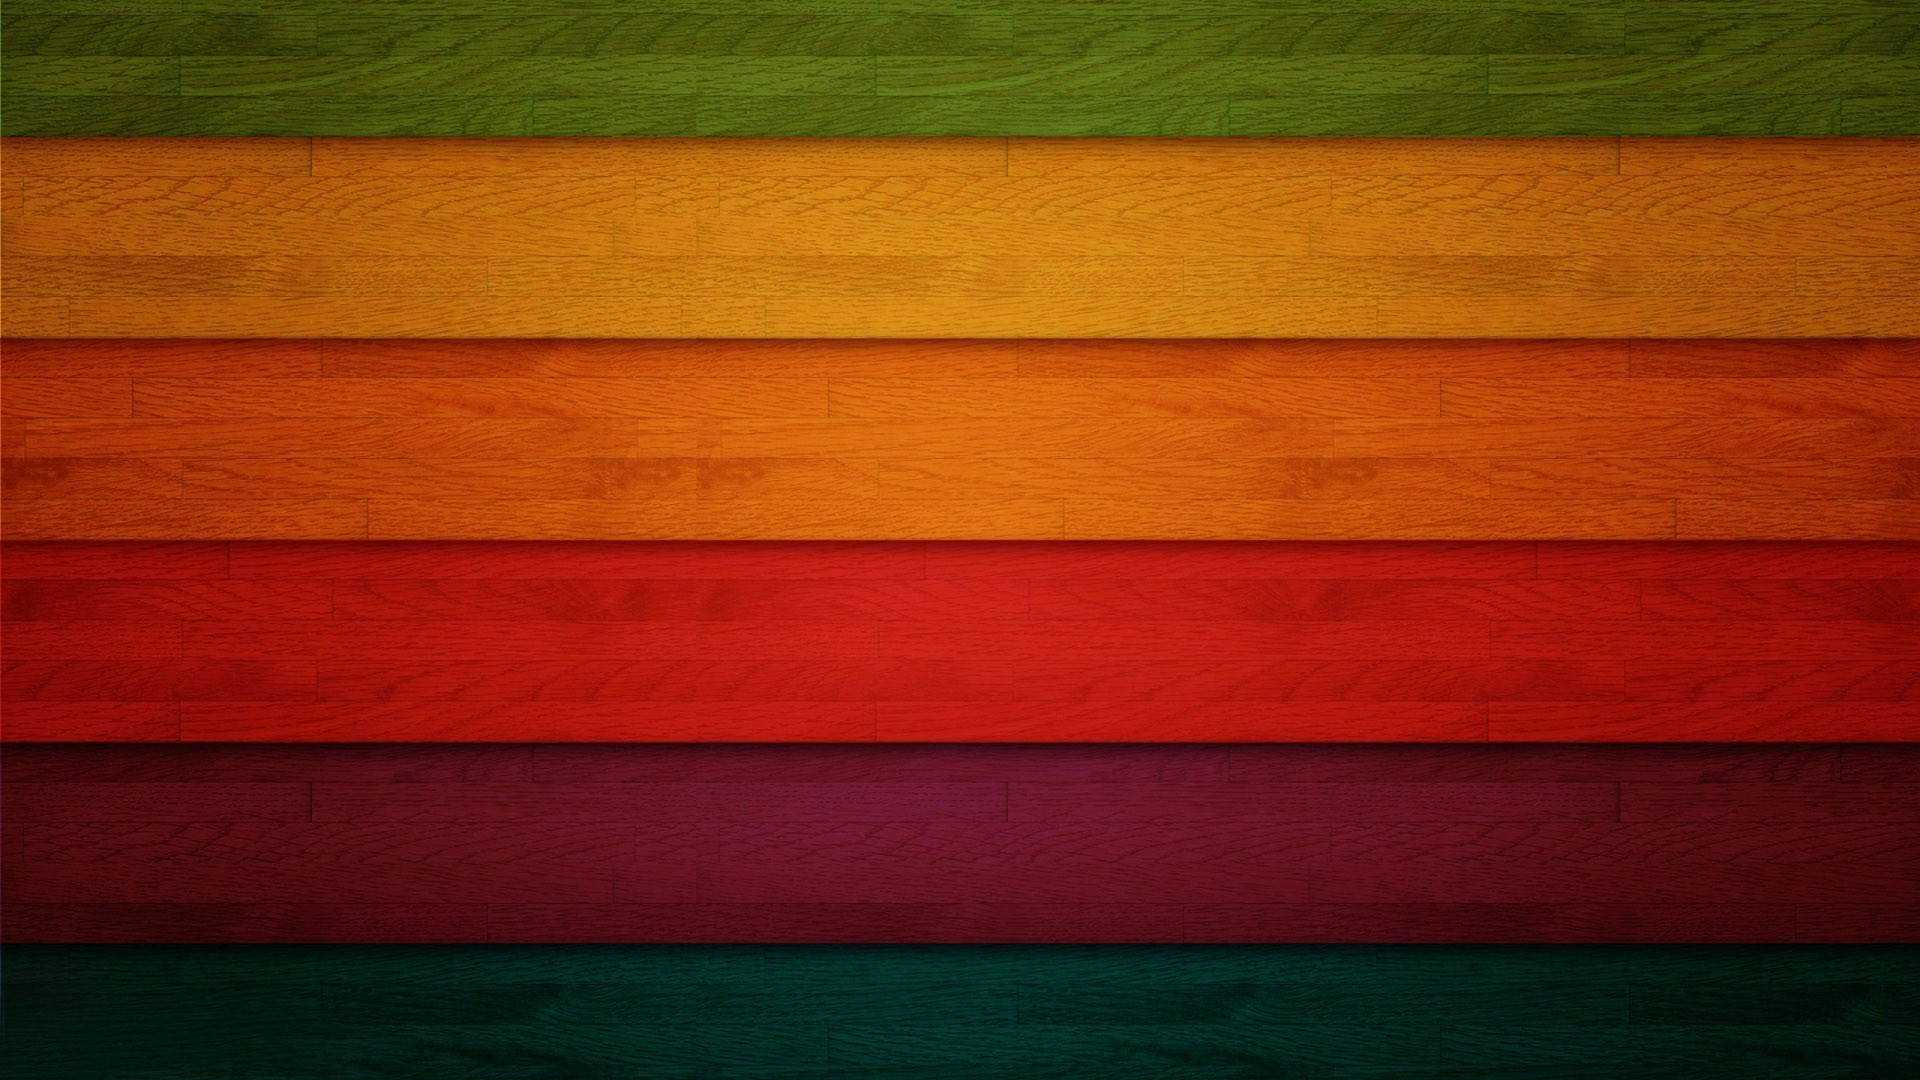 Colorful wood panels wallpaper 10820 1920x1080